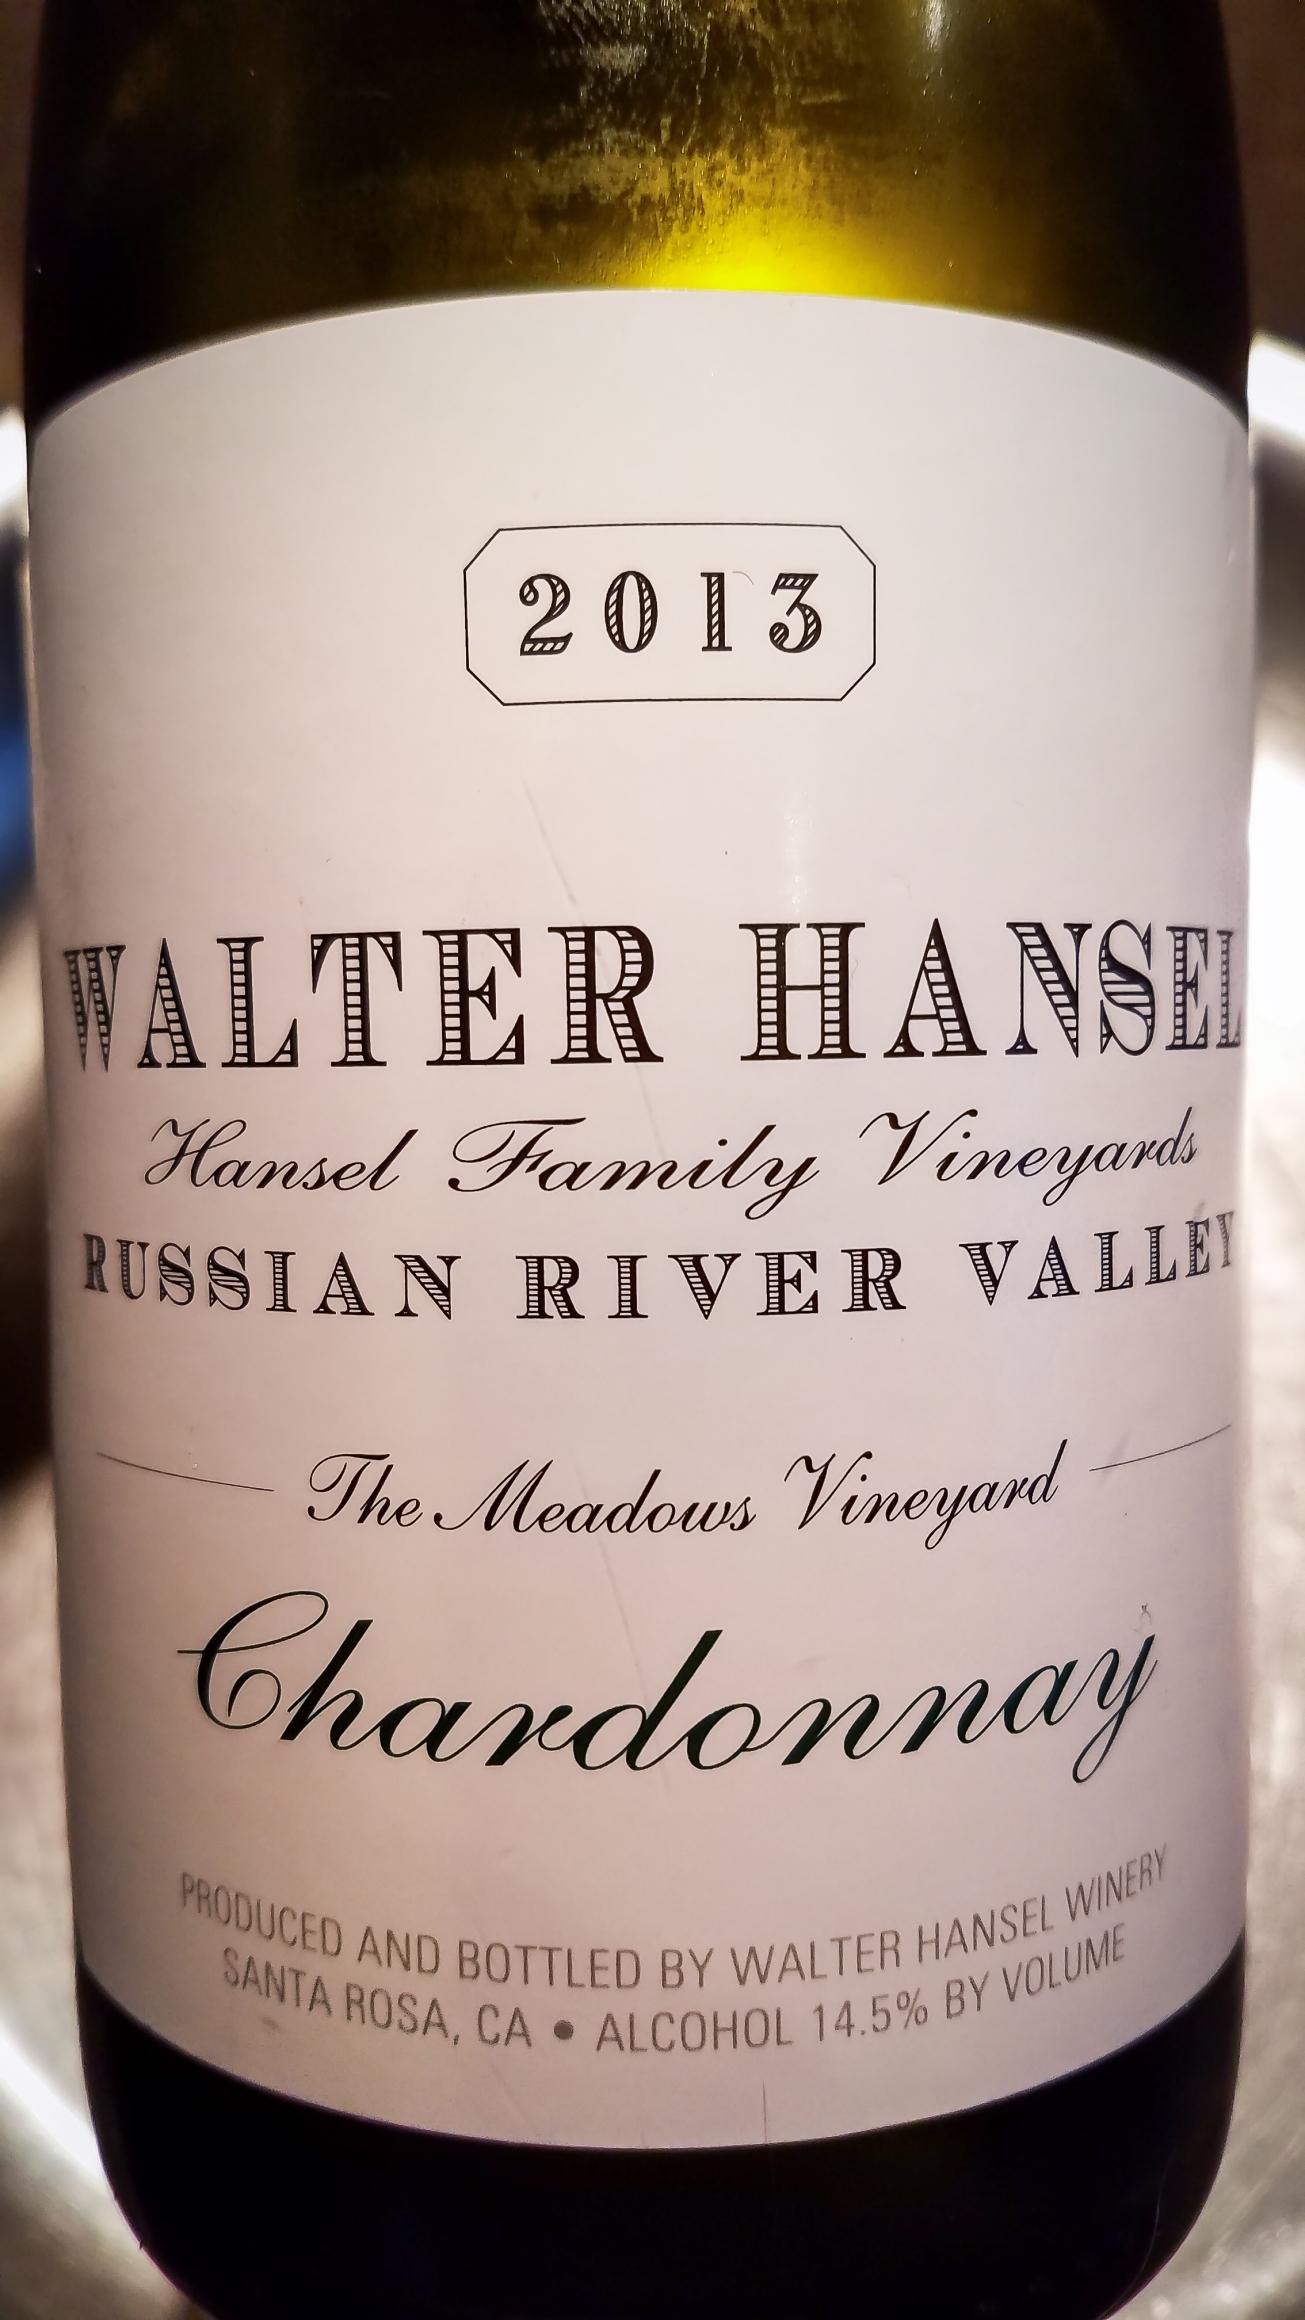 2013 Walter Hansel Winery Chardonnay The Meadows Vineyard